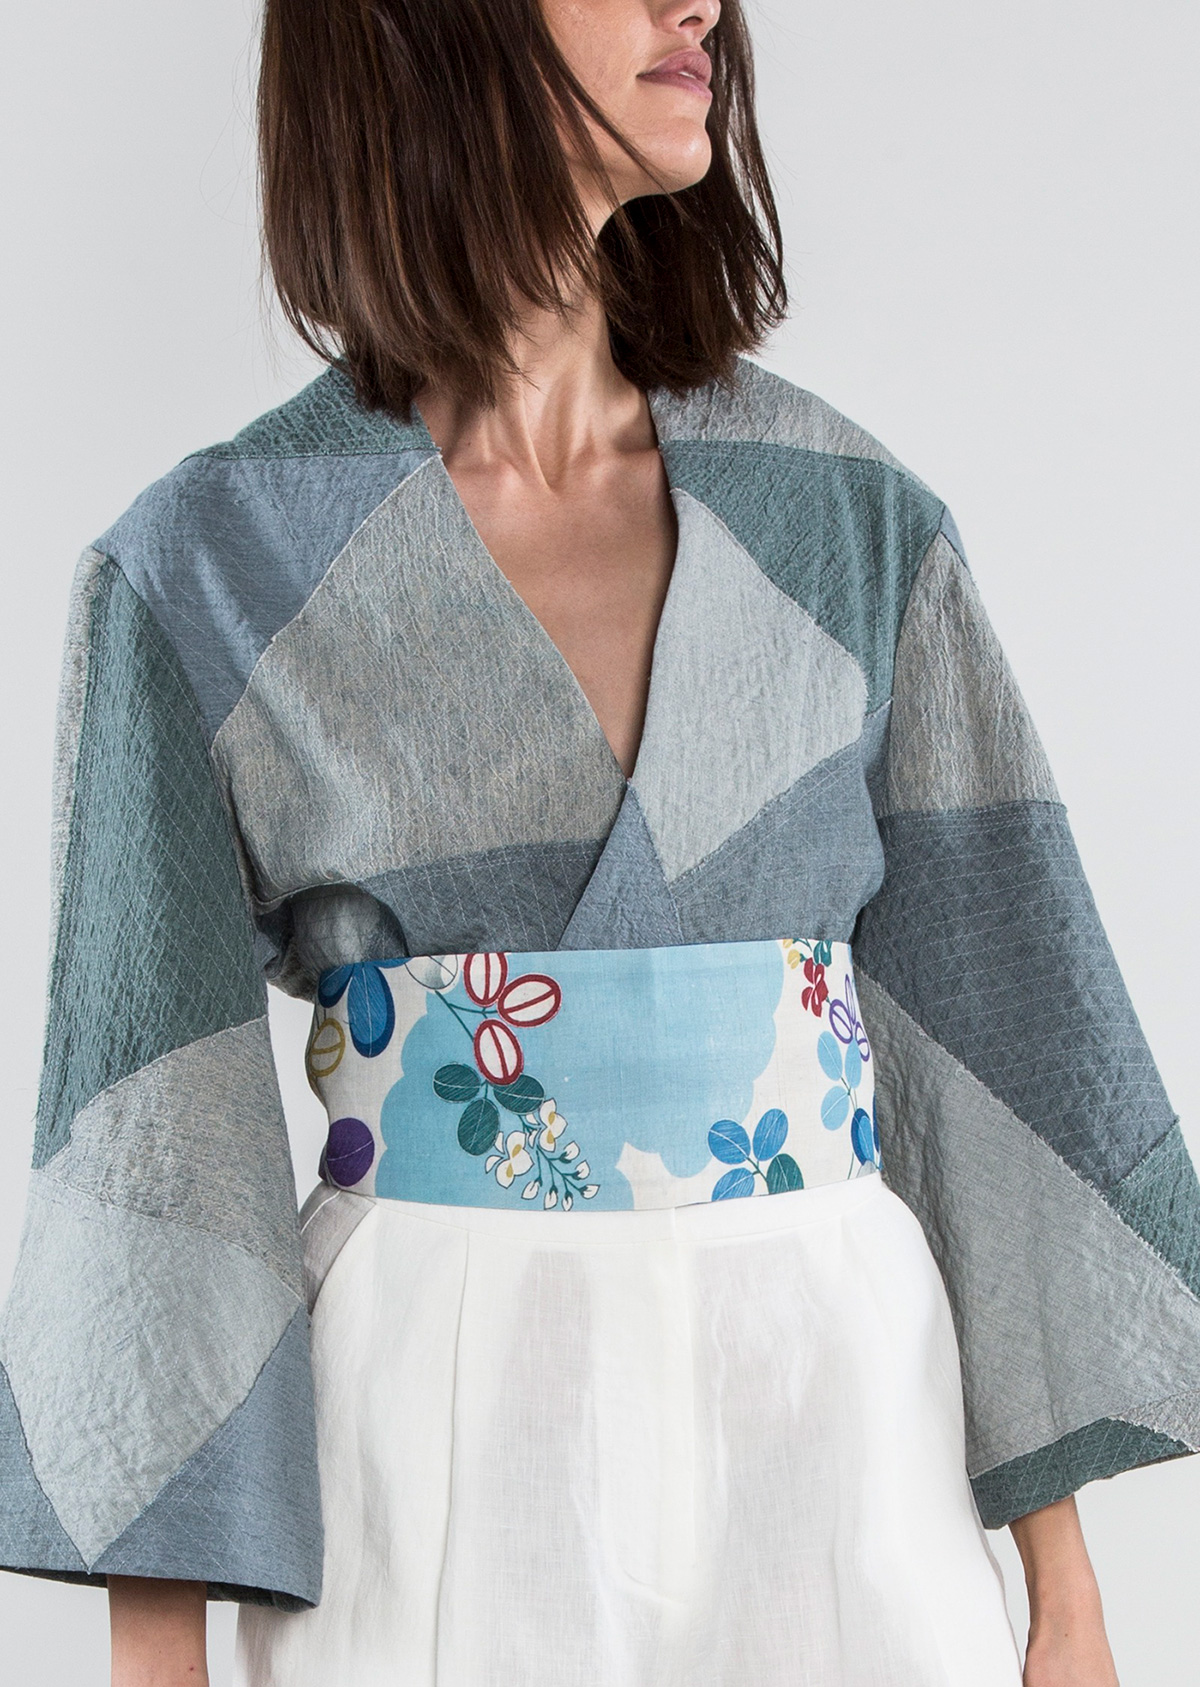 Wrap Belt in Vintage Japanese Linen Floral Reversed to Blue/Cream Tie Dye  $295